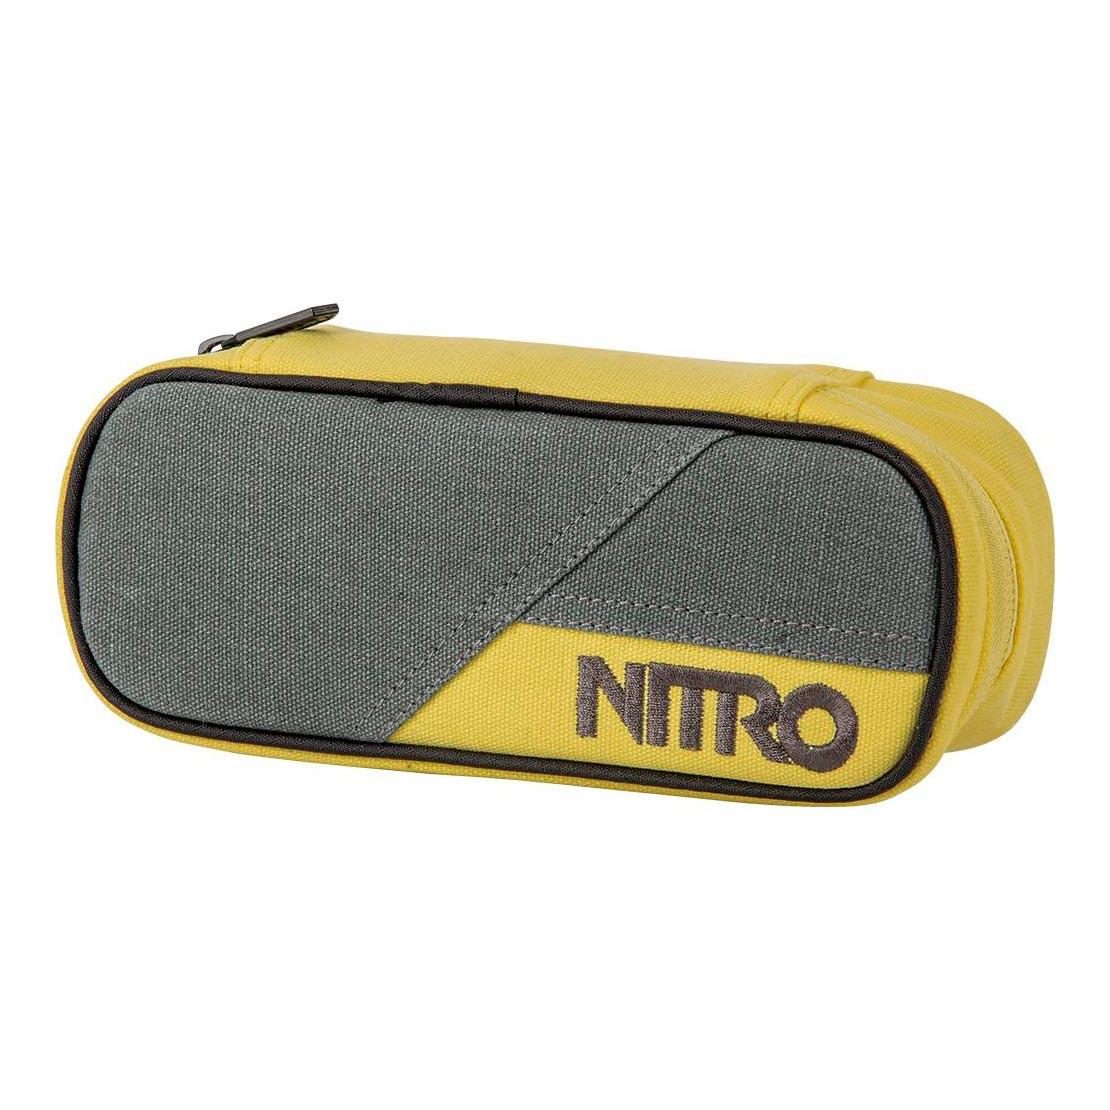 Školní pouzdro Nitro Pencil Case gunmetal